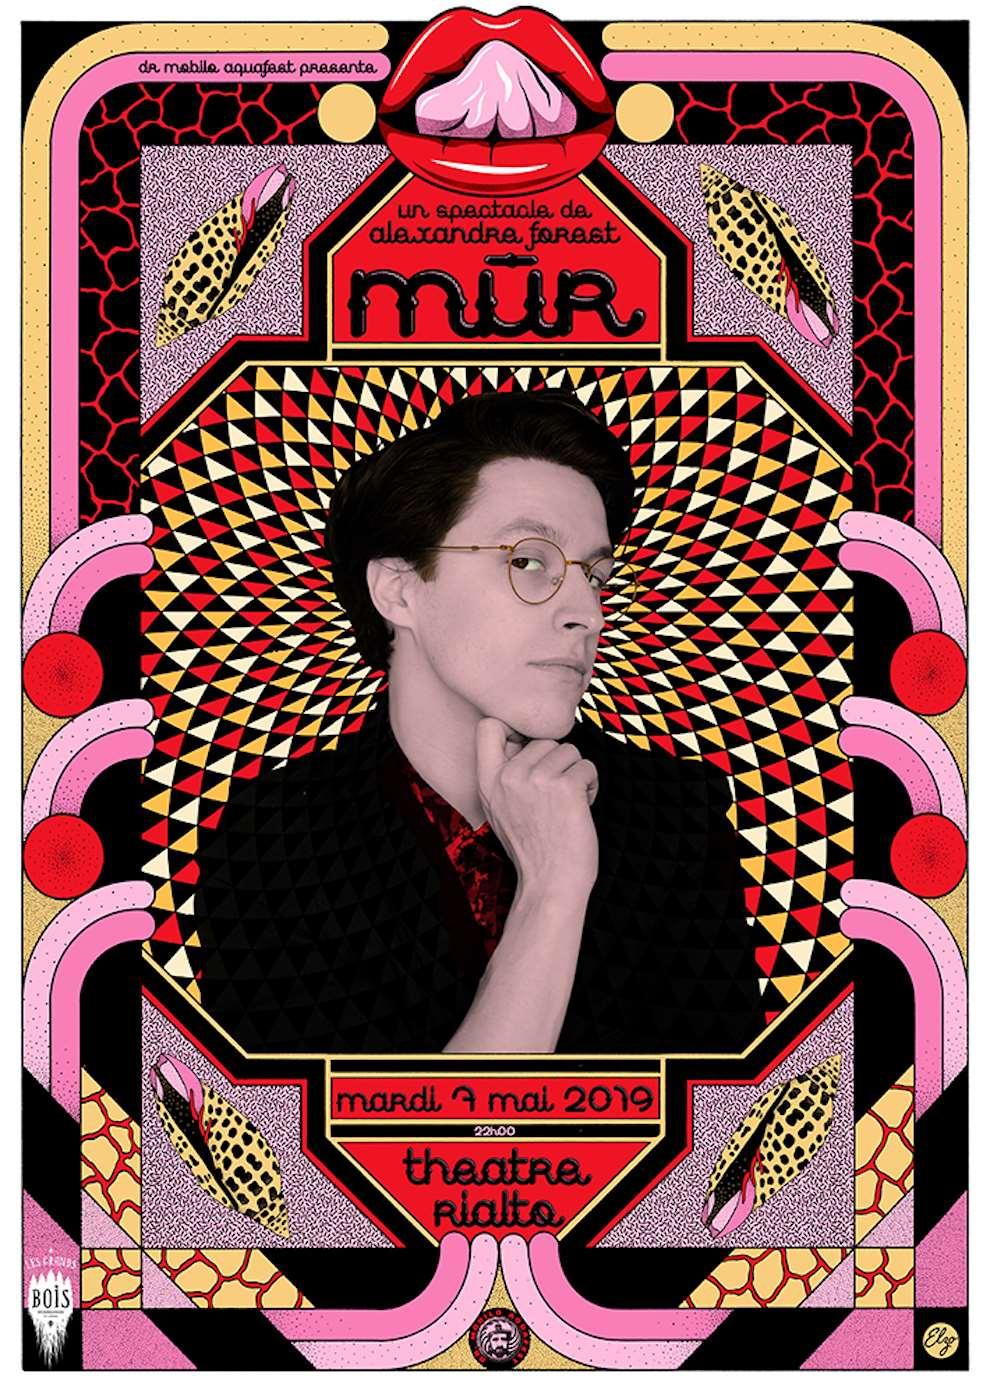 Elzo Durt, Elzo Durt Psychedelic, bold and graphic decorative design.